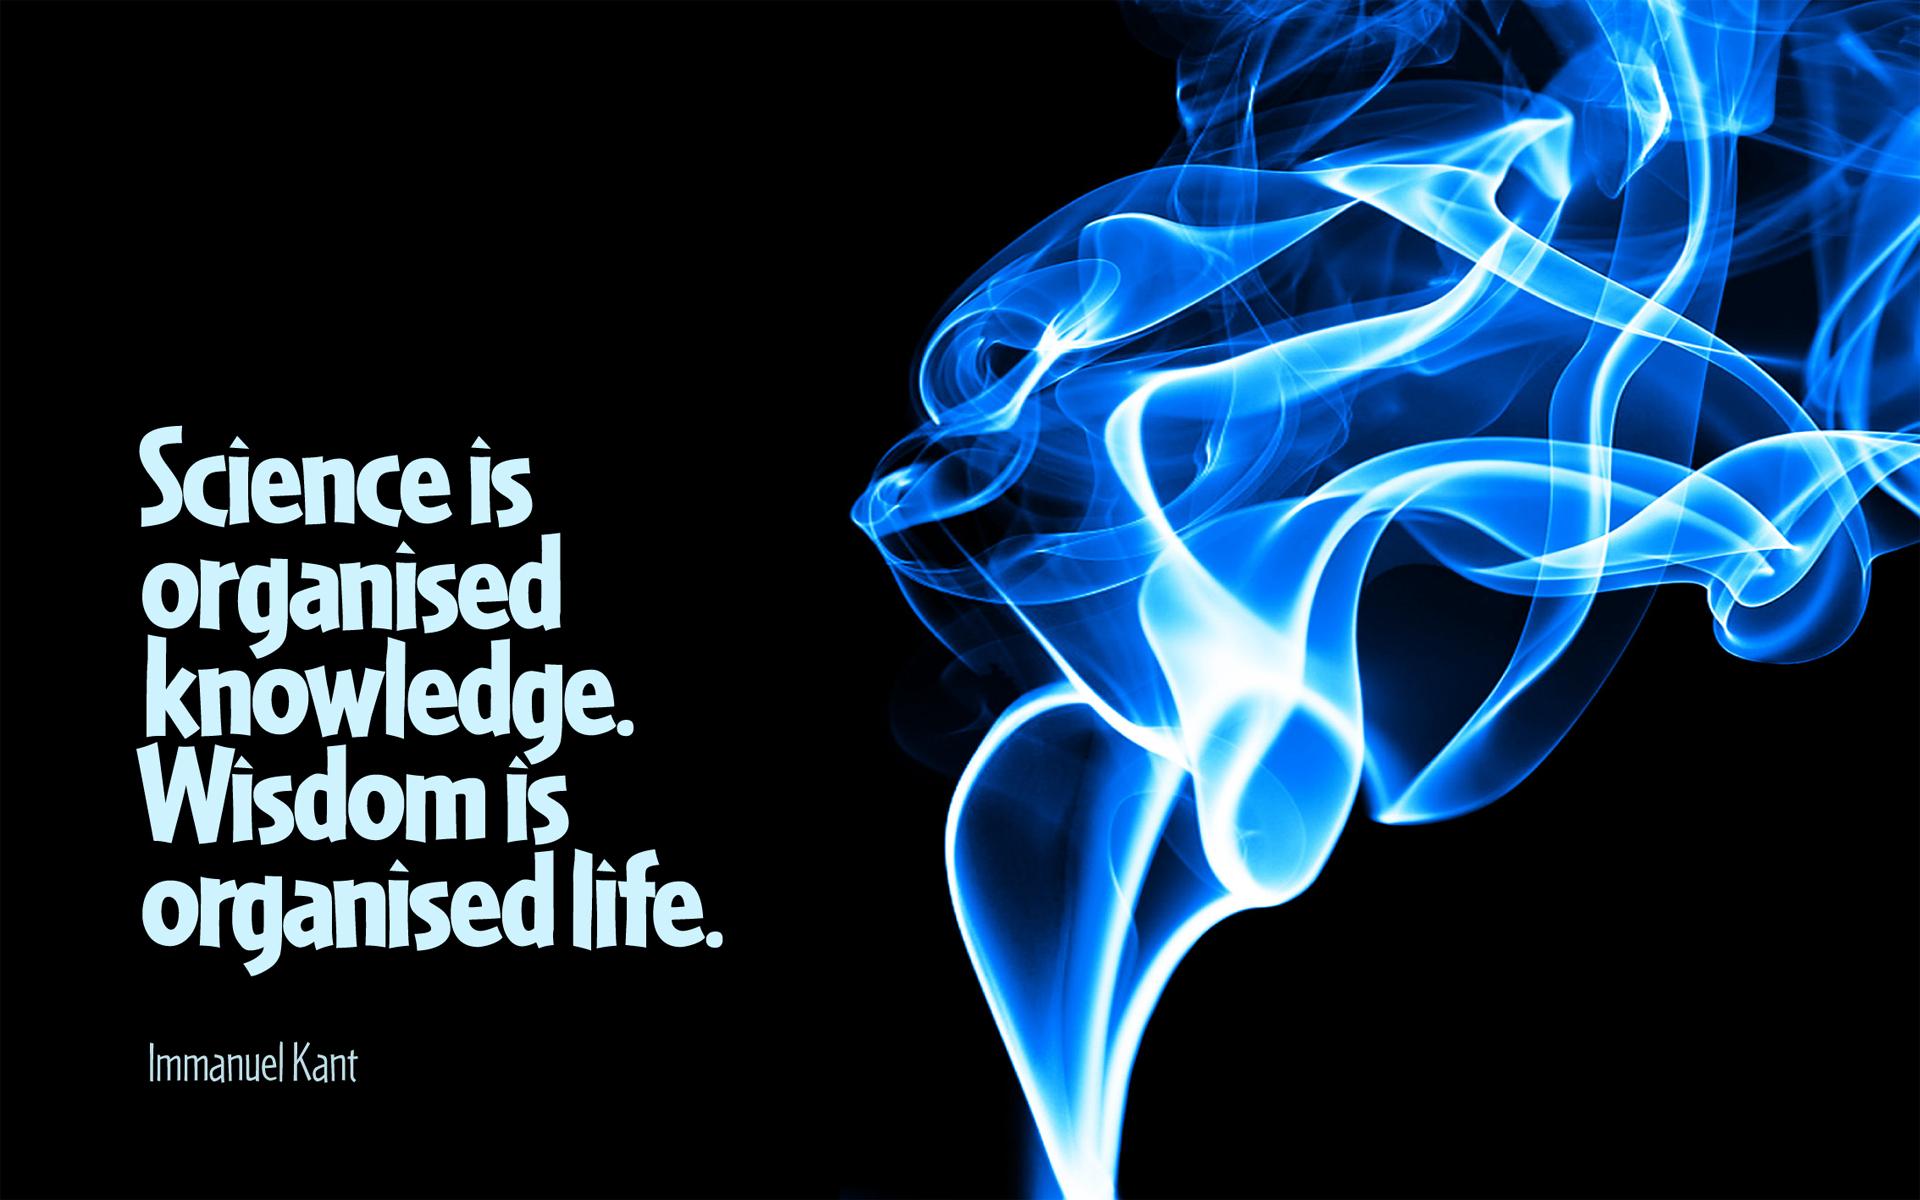 Science is organised knowledge. Wisdom is organised life. – Immanuel Kant [1920 x 1200]